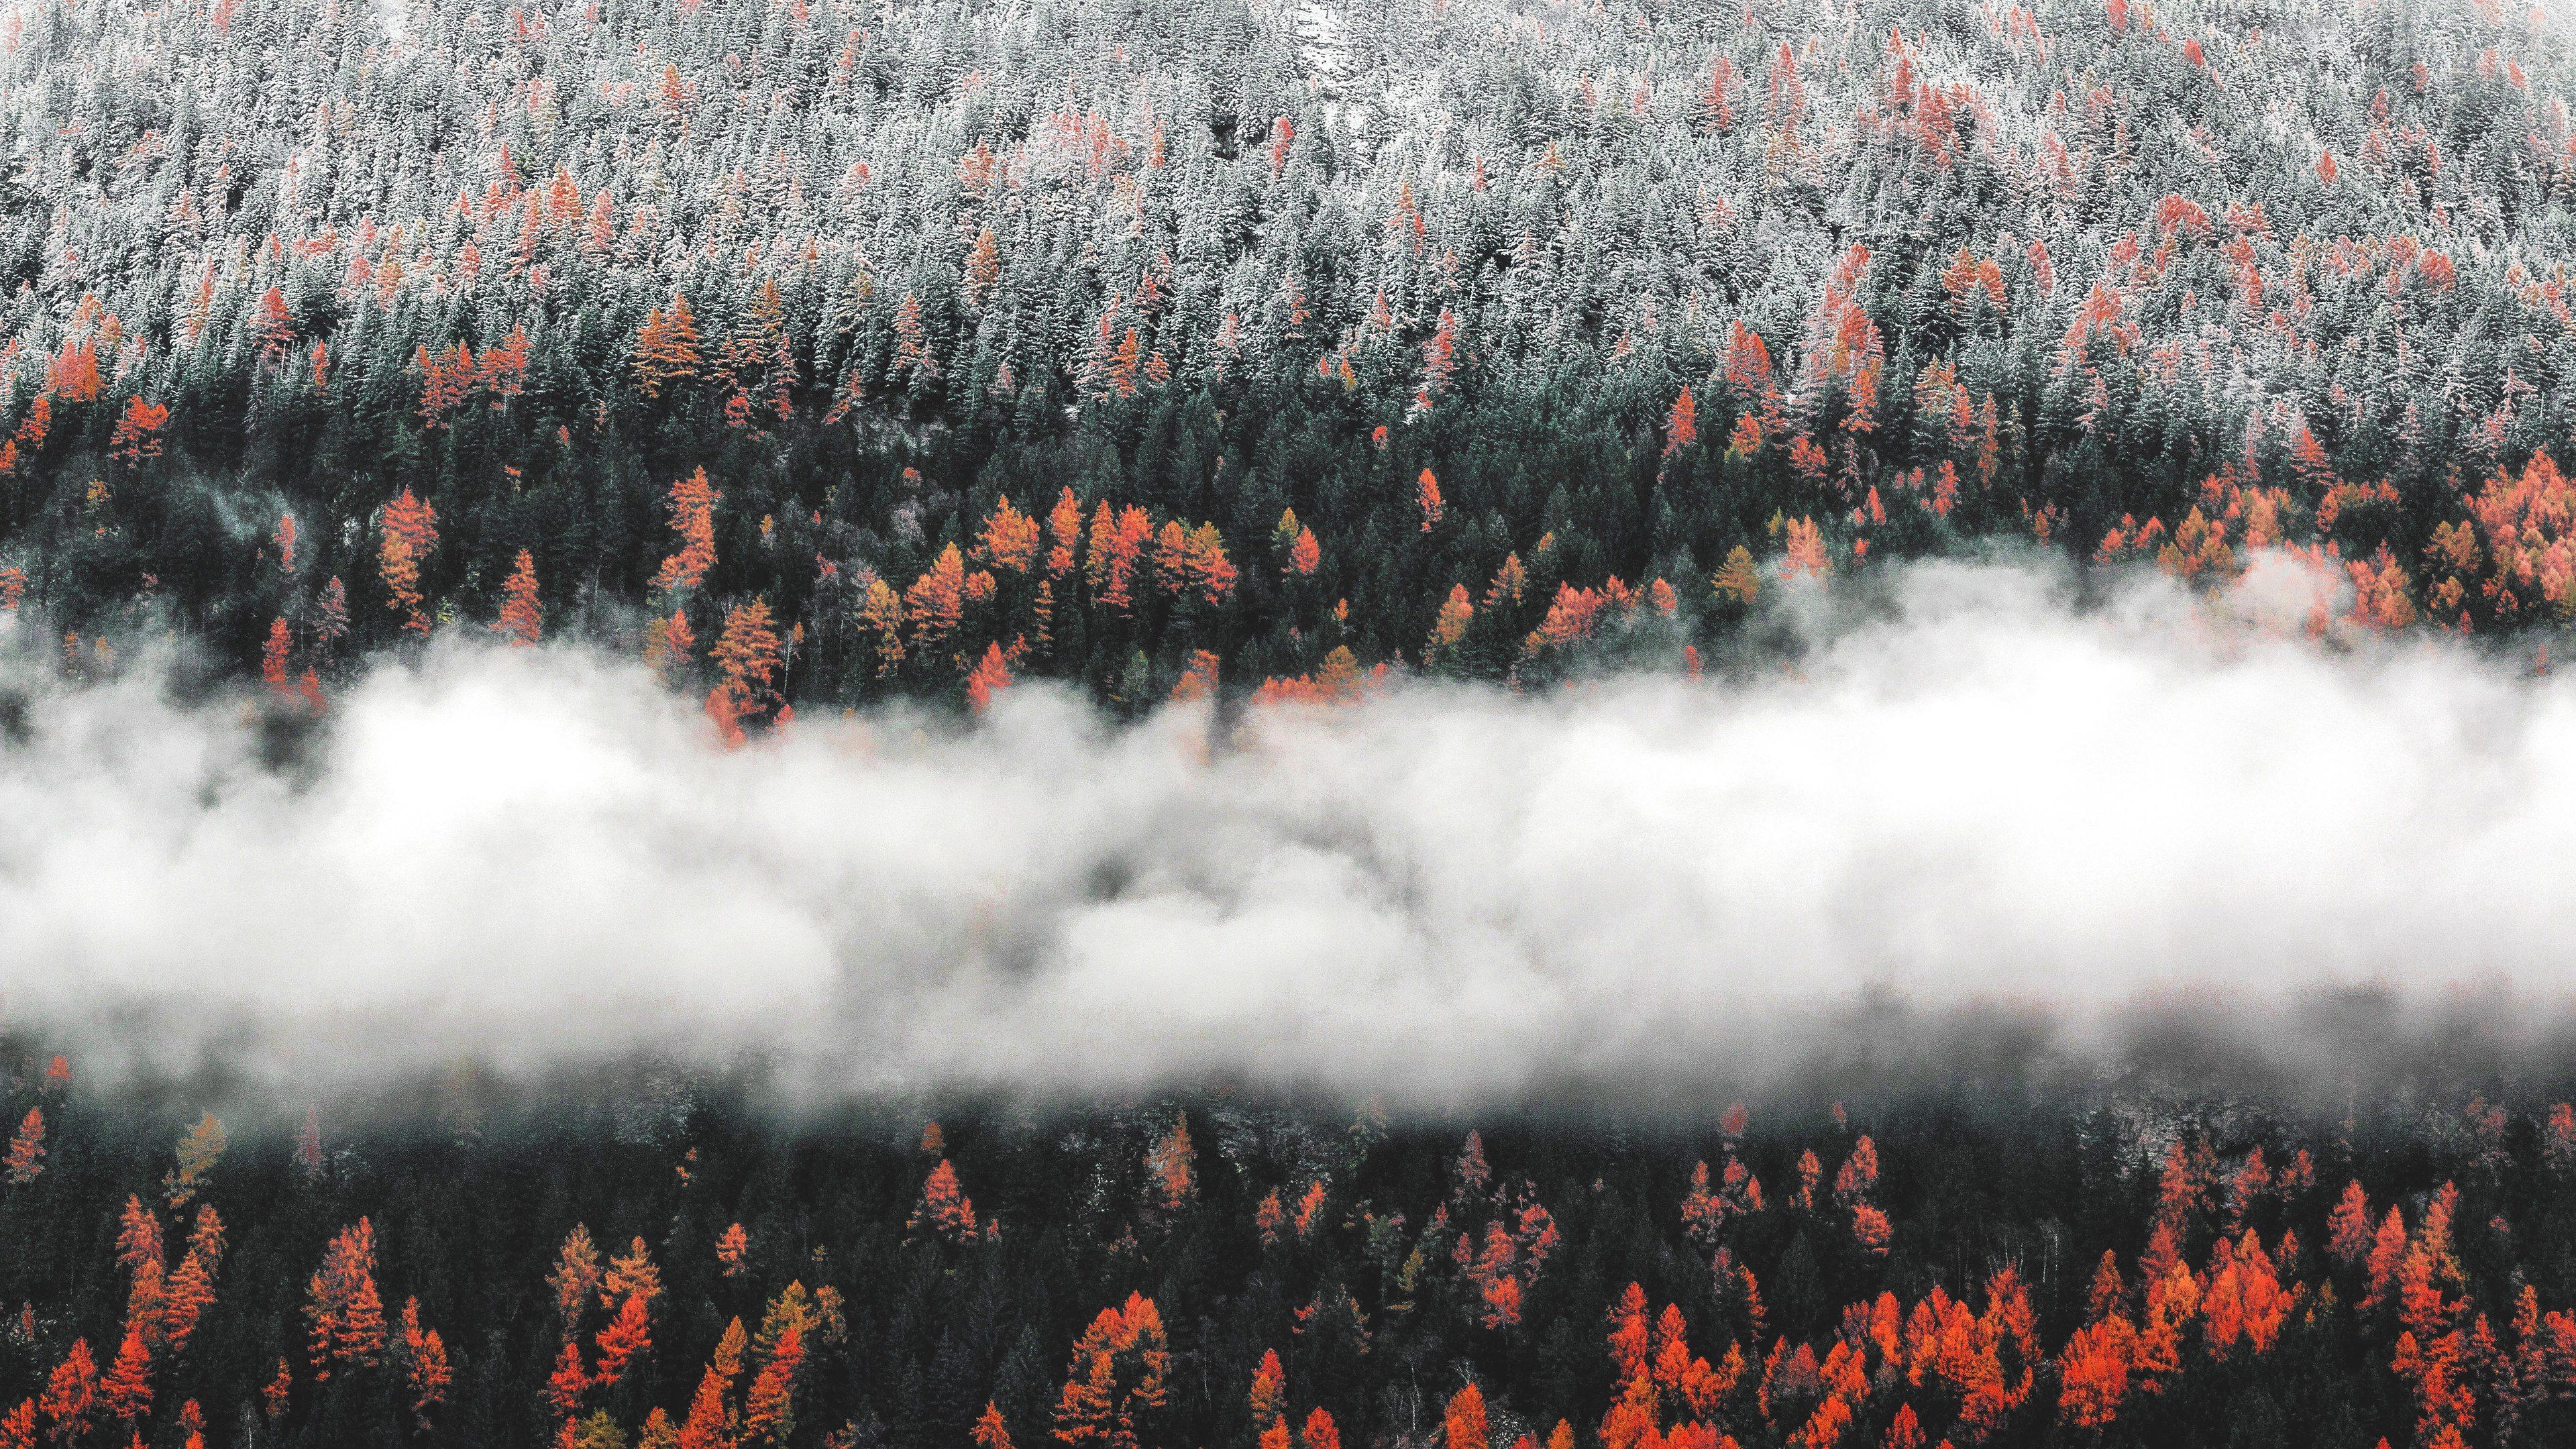 orange tress autumn forest landscape mist scenic nature 4k 1540135366 - Orange Tress Autumn Forest Landscape Mist Scenic Nature 4k - trees wallpapers, nature wallpapers, mist wallpapers, landscape wallpapers, hd-wallpapers, forest wallpapers, fog wallpapers, autumn wallpapers, 5k wallpapers, 4k-wallpapers